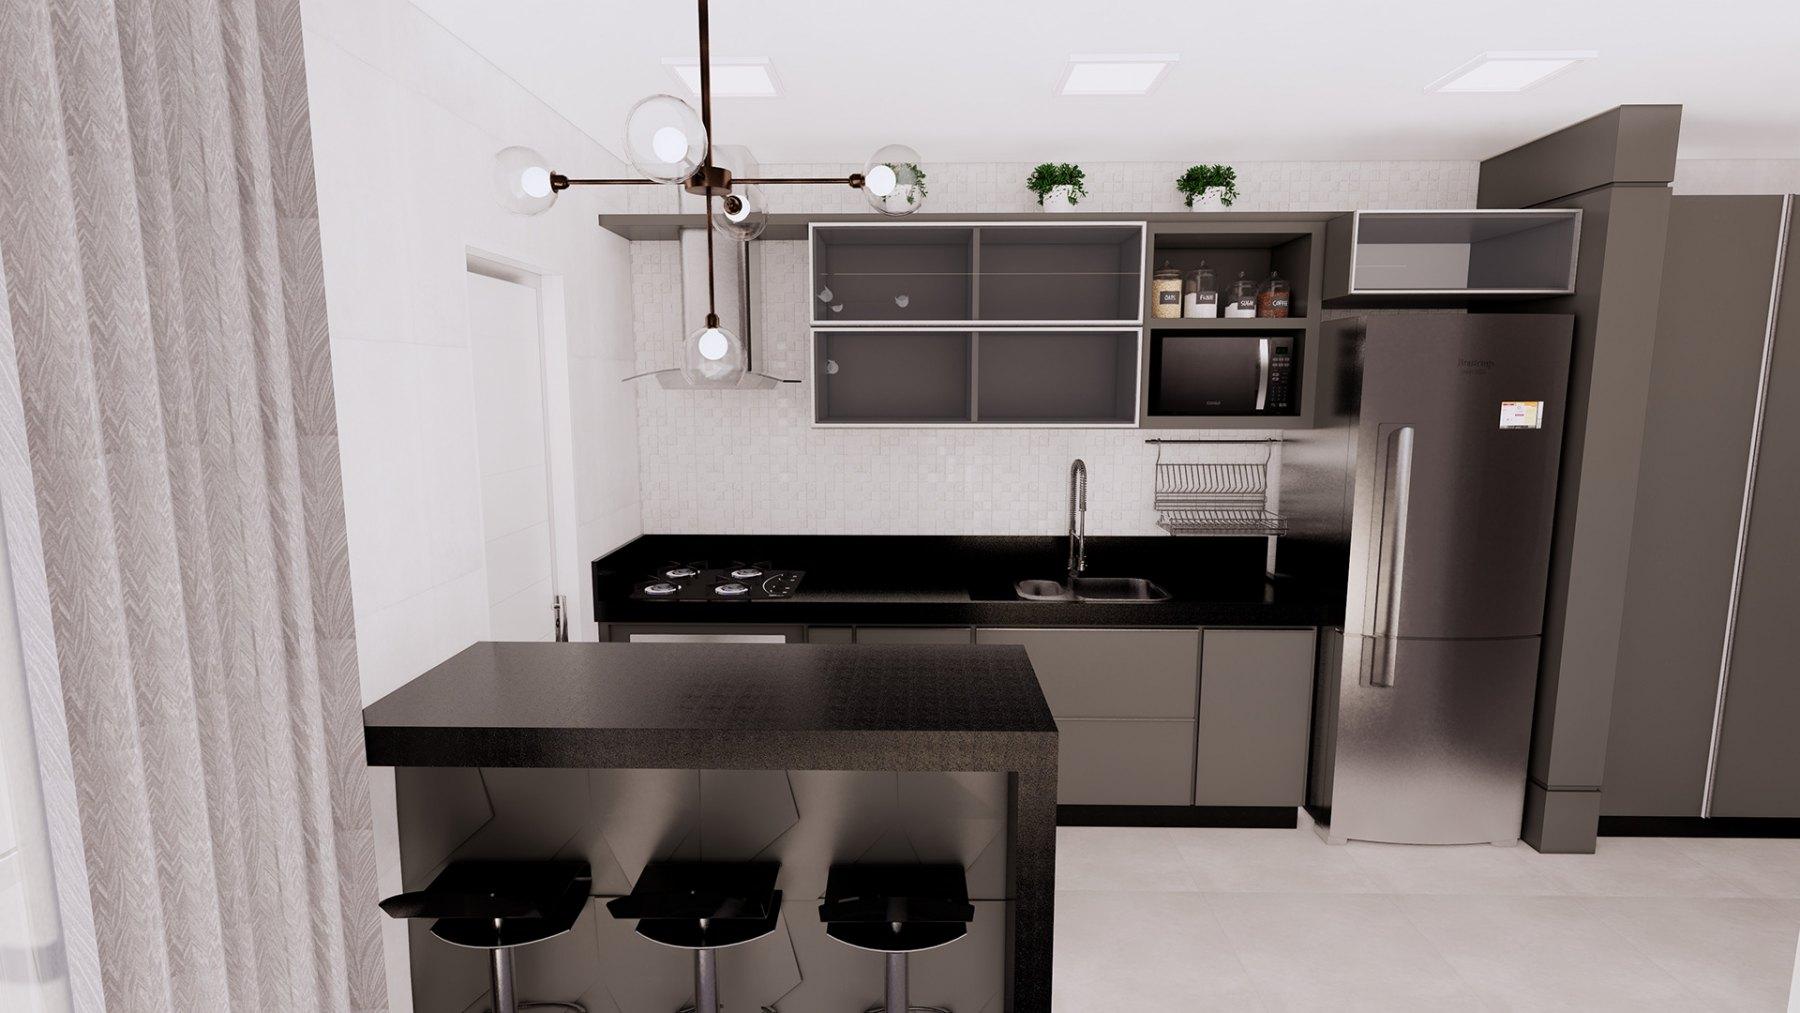 Cozinha-Blumenau-1